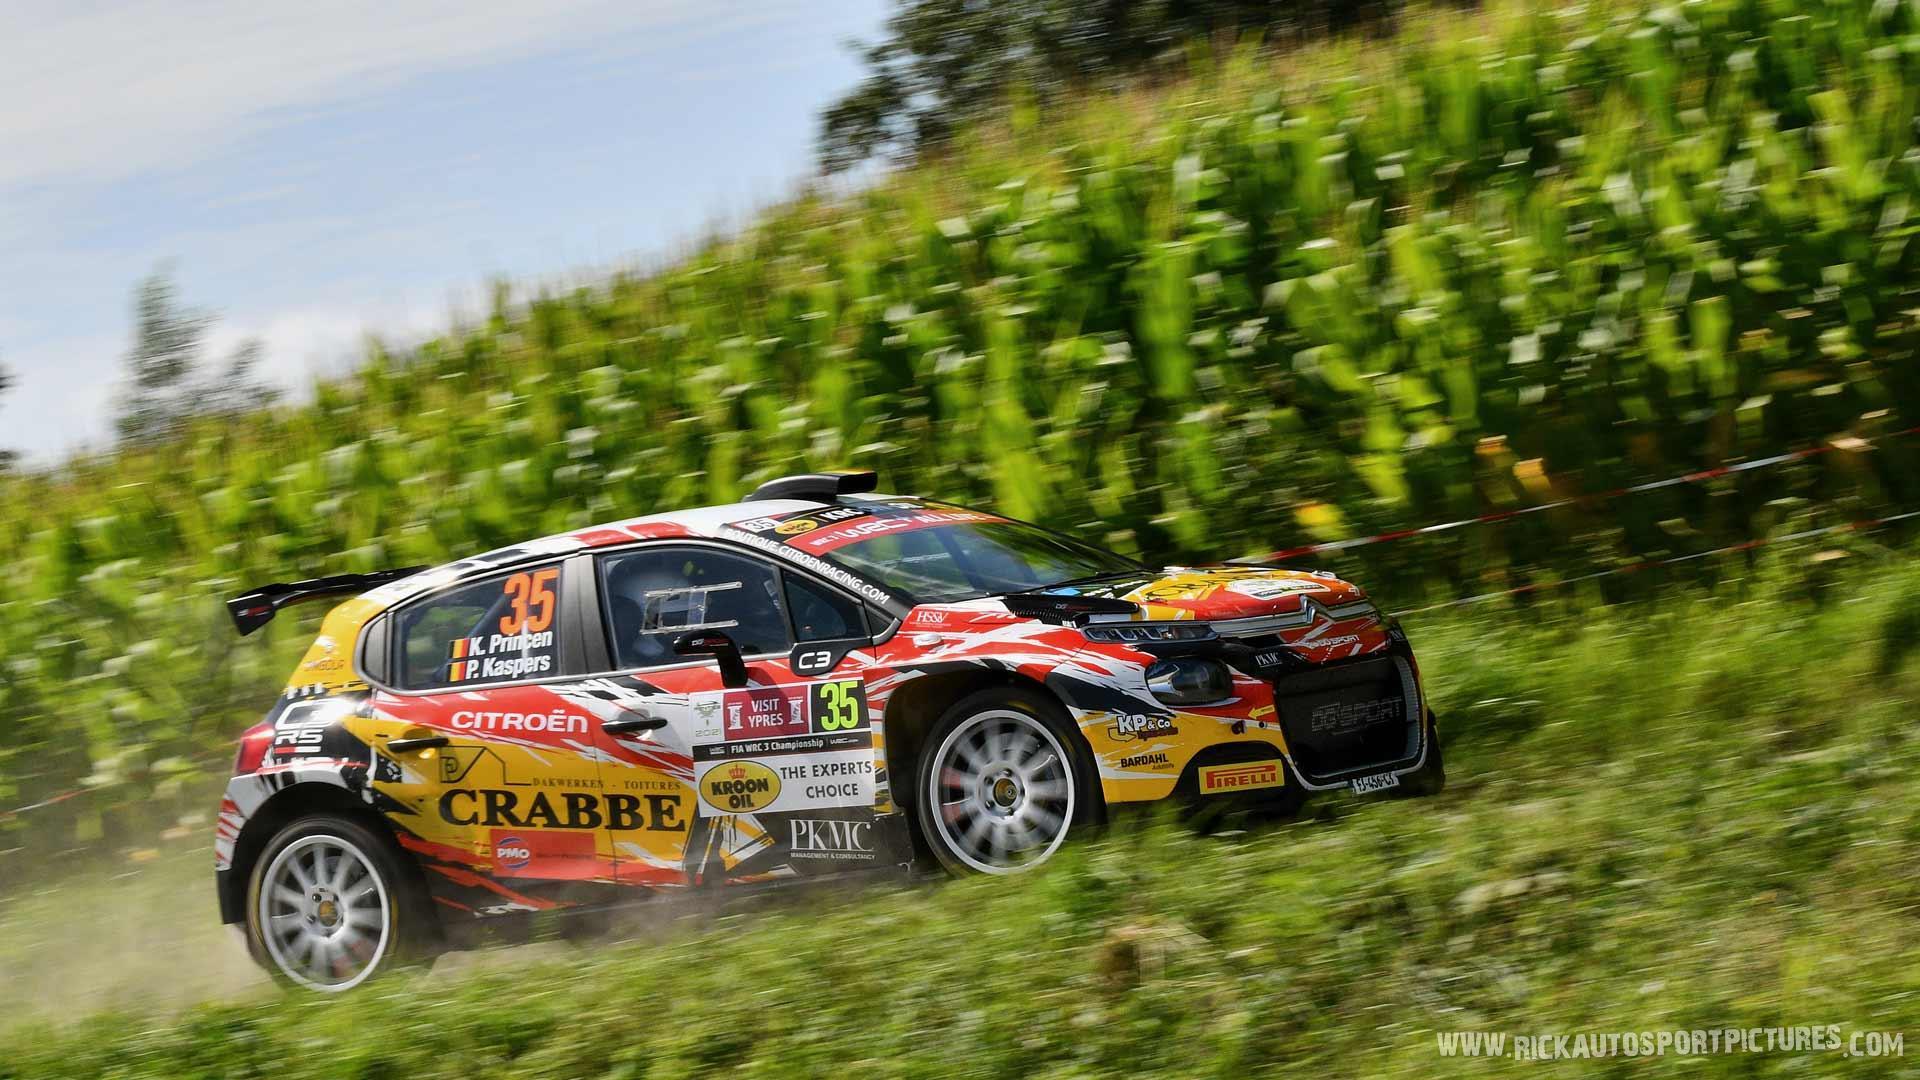 Kris Princen Ypres Ieper Rally 2021